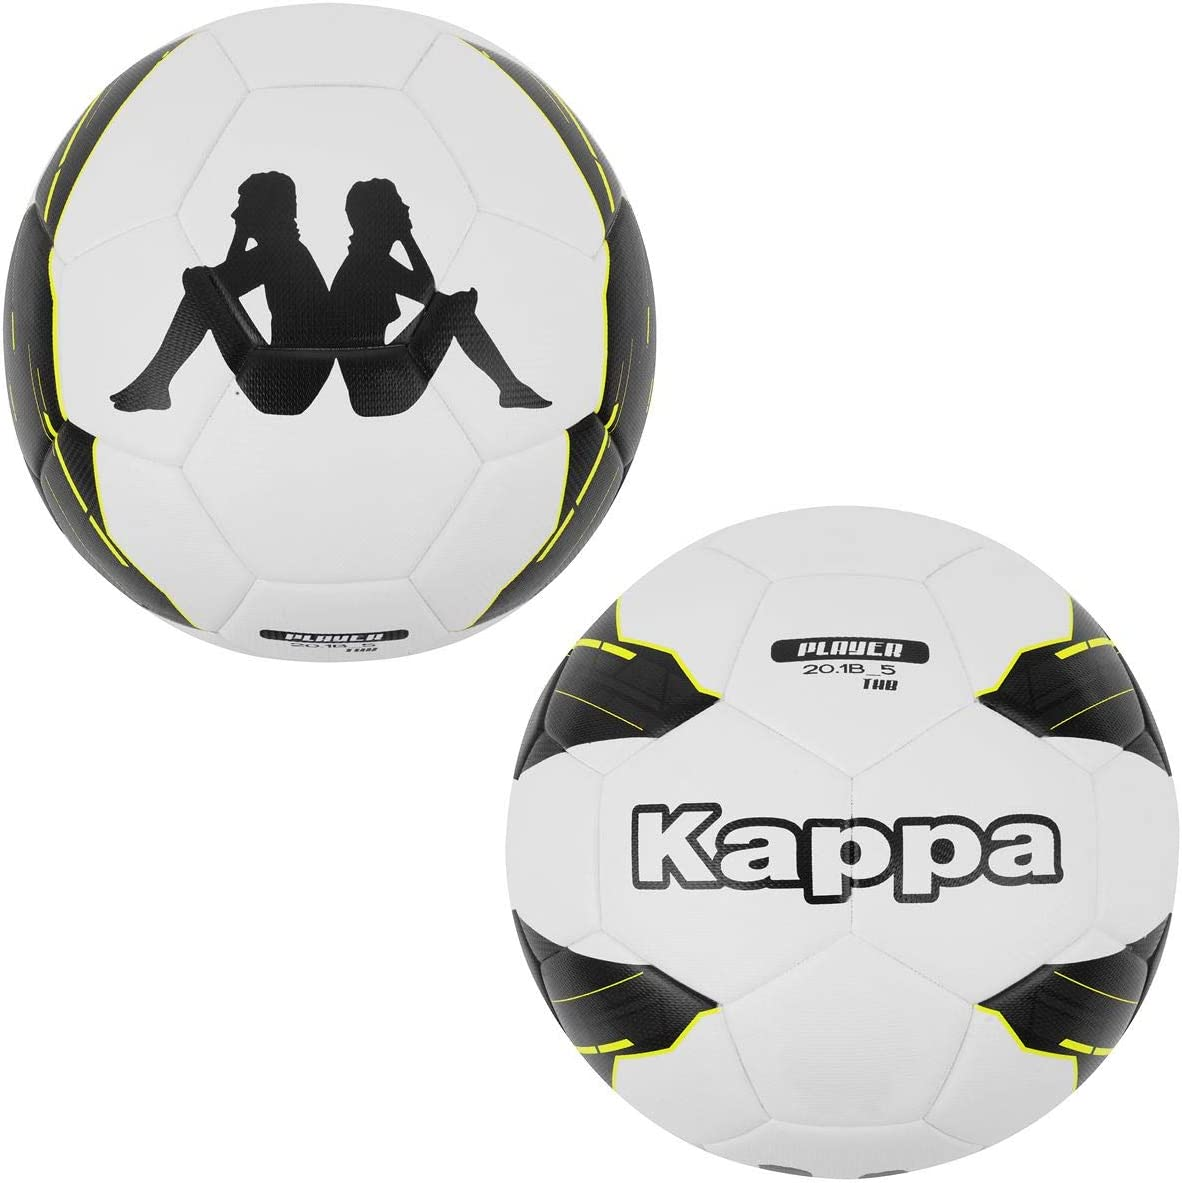 Kappa Unisex Player 20.1B THB